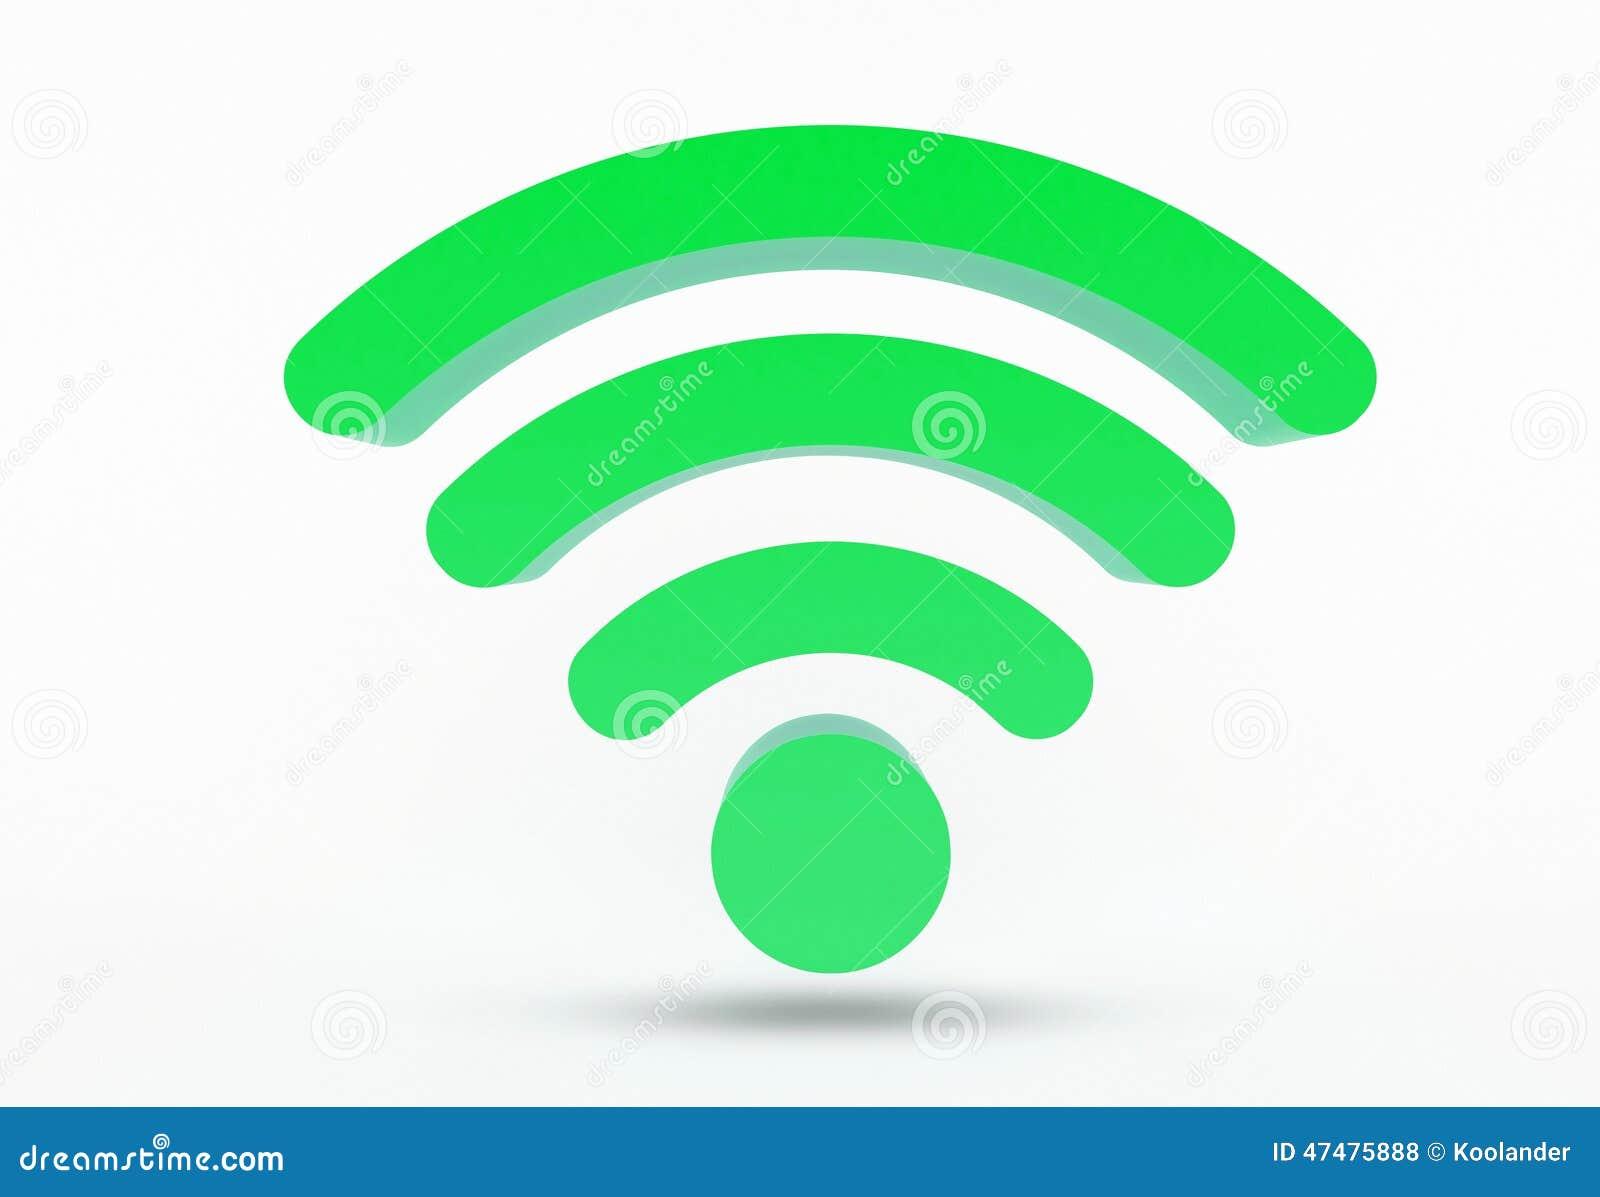 WiFi icon - symbol isolated on white background.